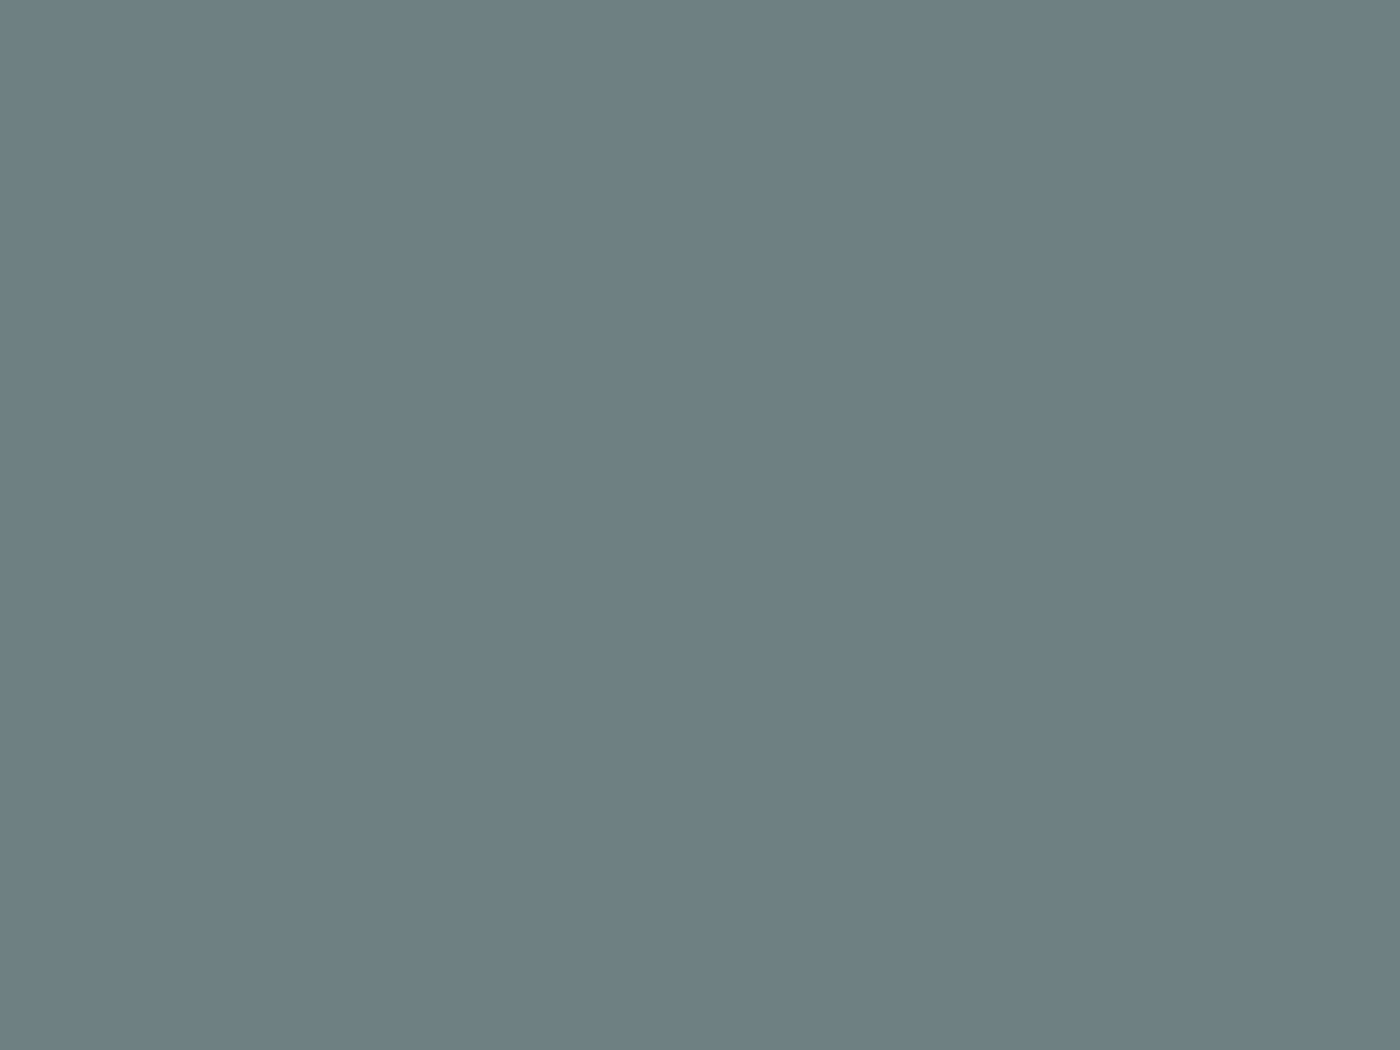 1400x1050 AuroMetalSaurus Solid Color Background